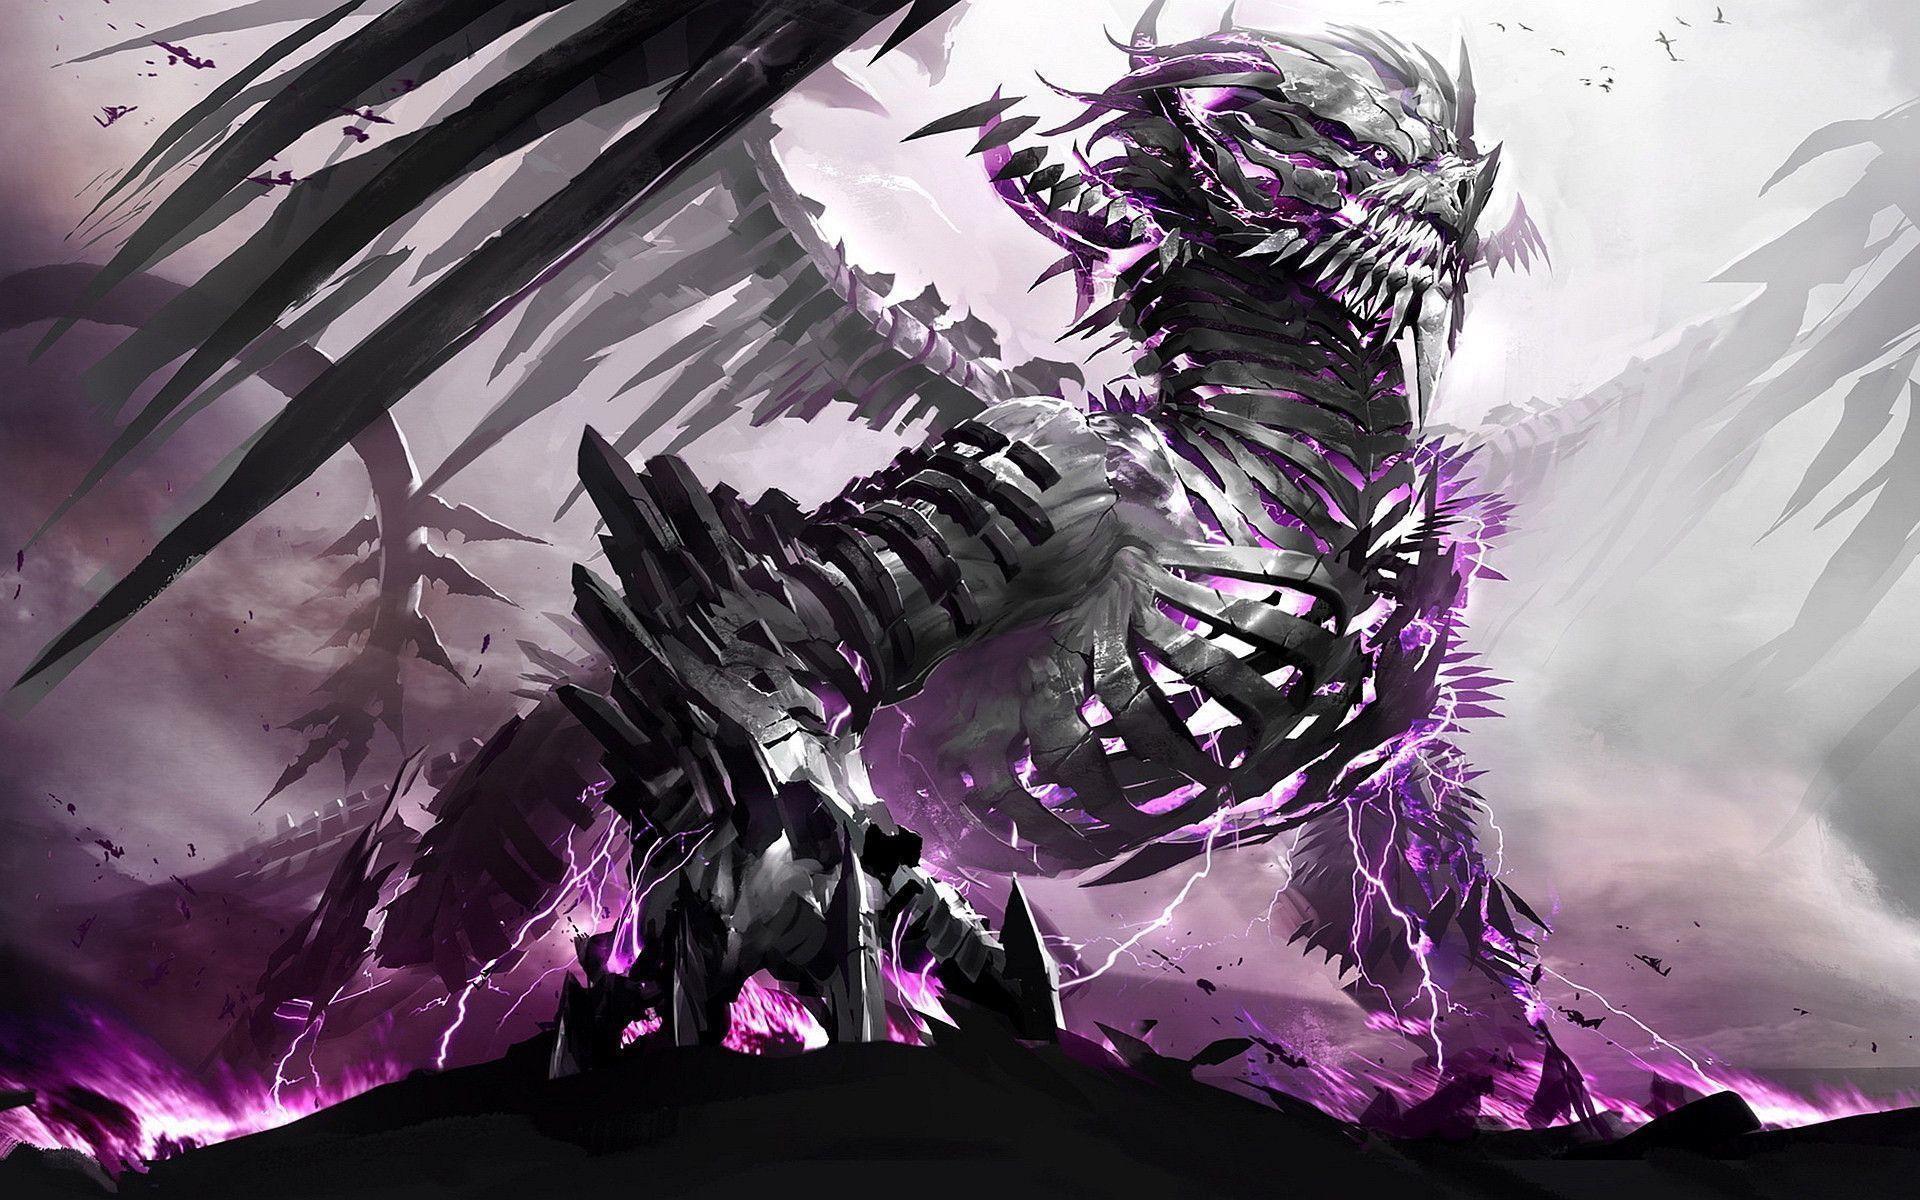 Black Dragon Wallpapers – Full HD wallpaper search